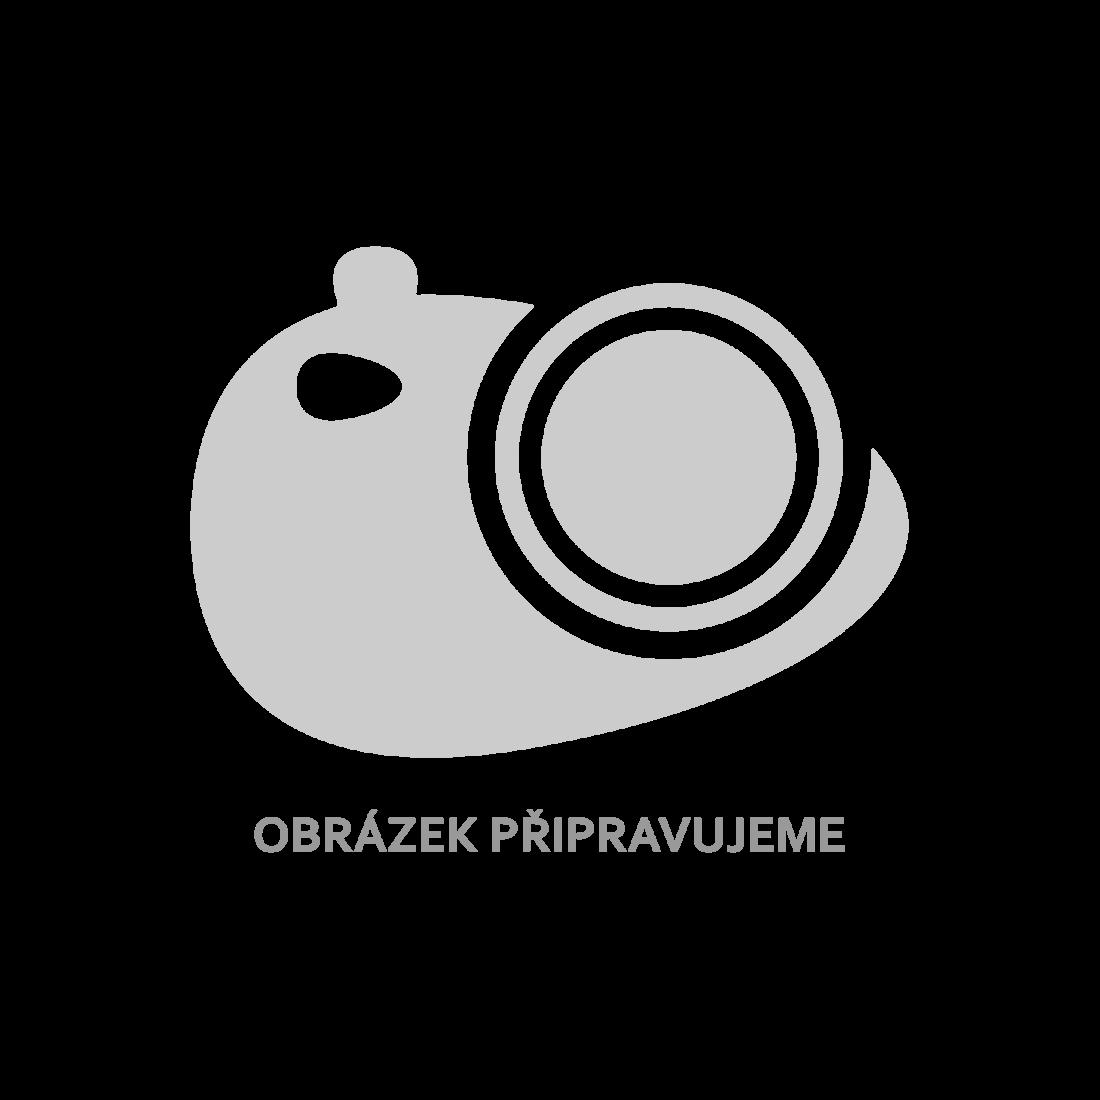 vidaXL Nástěnný noční stolek bílý a dub sonoma 40x30x15 cm dřevotříska [800316]